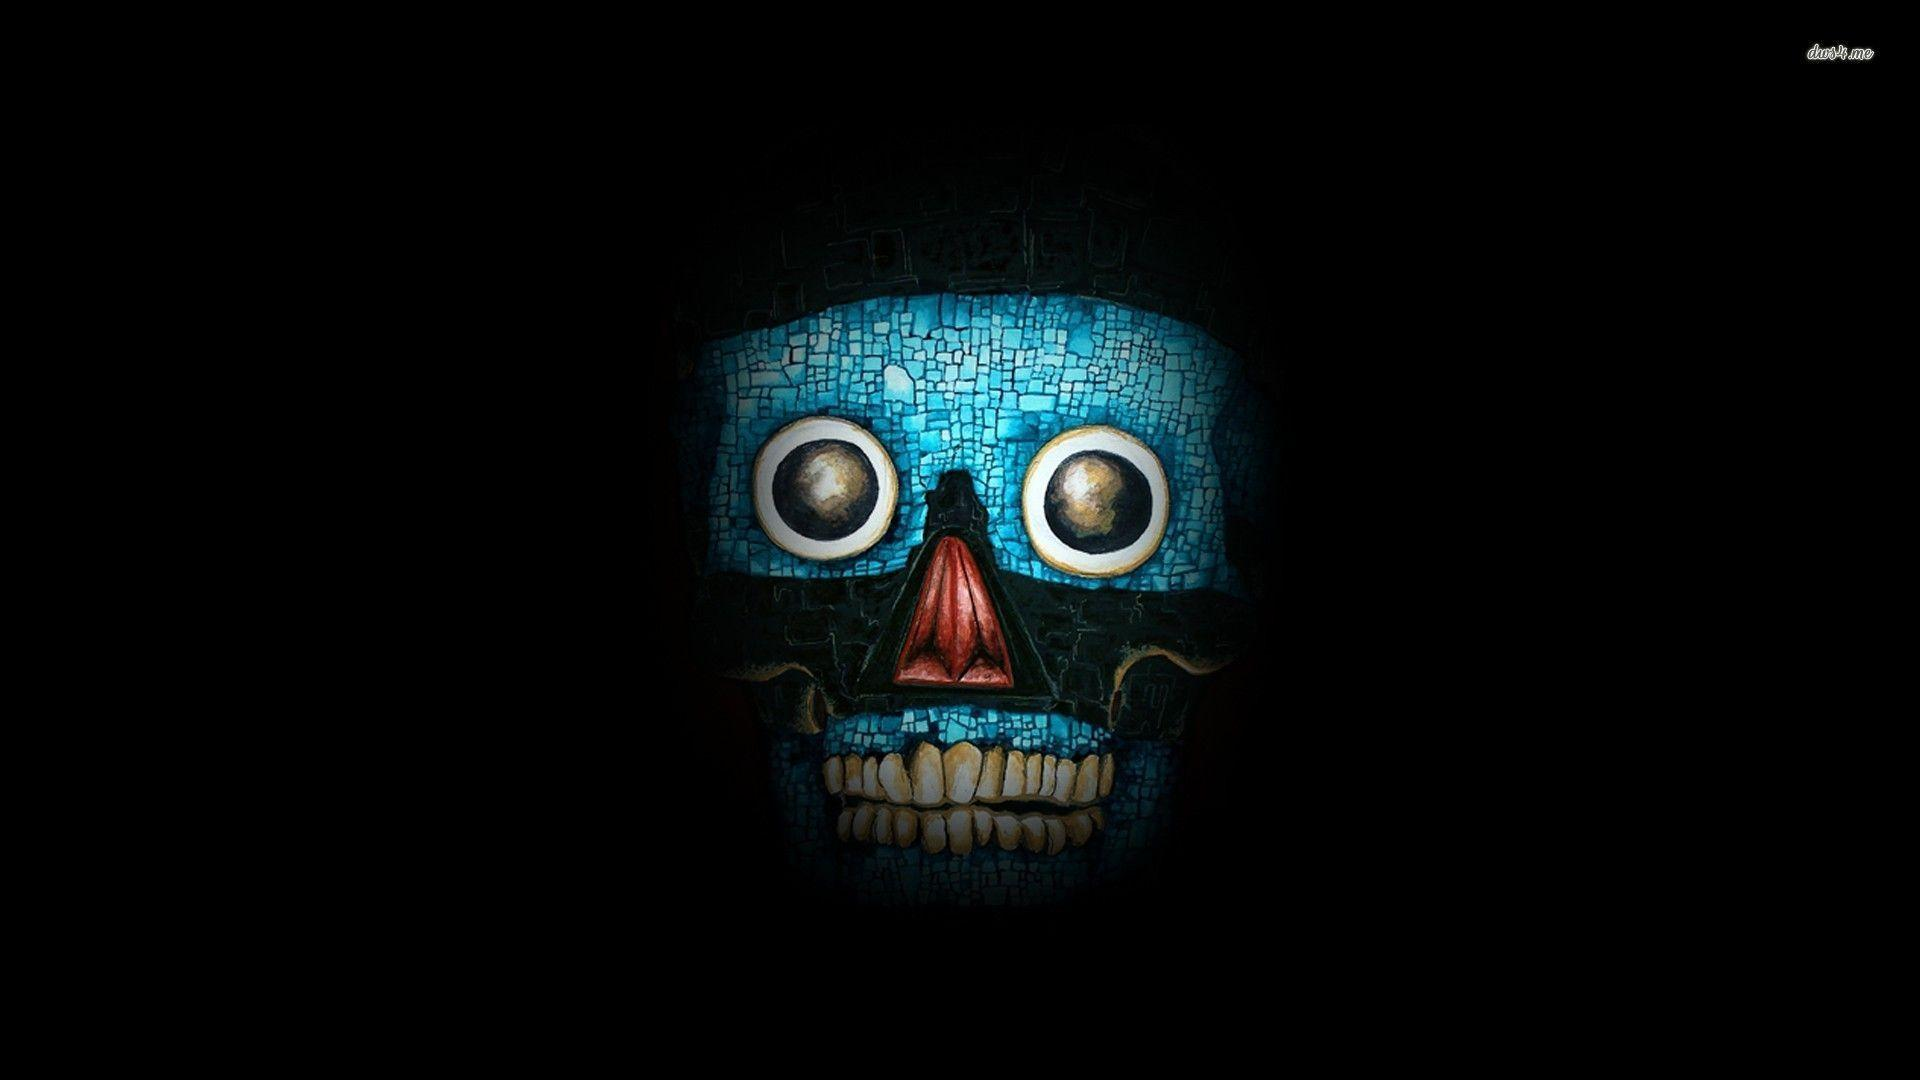 Incredible Neon Skull Wallpaper: Skull Art Wallpapers